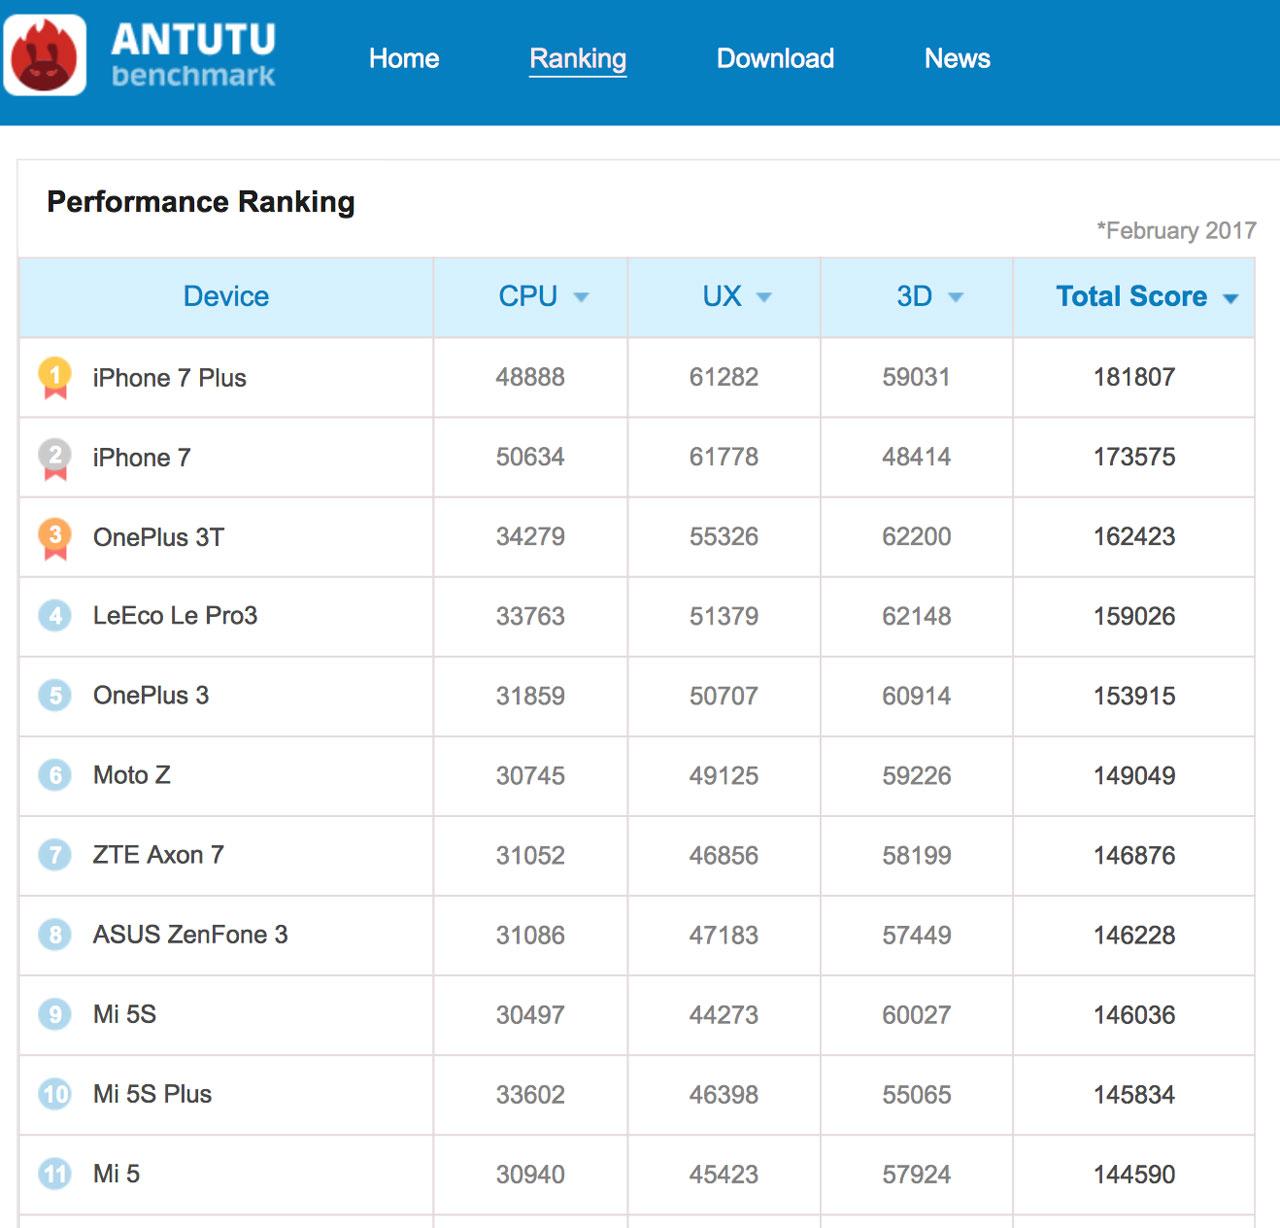 antutu-ranking-feb-2017